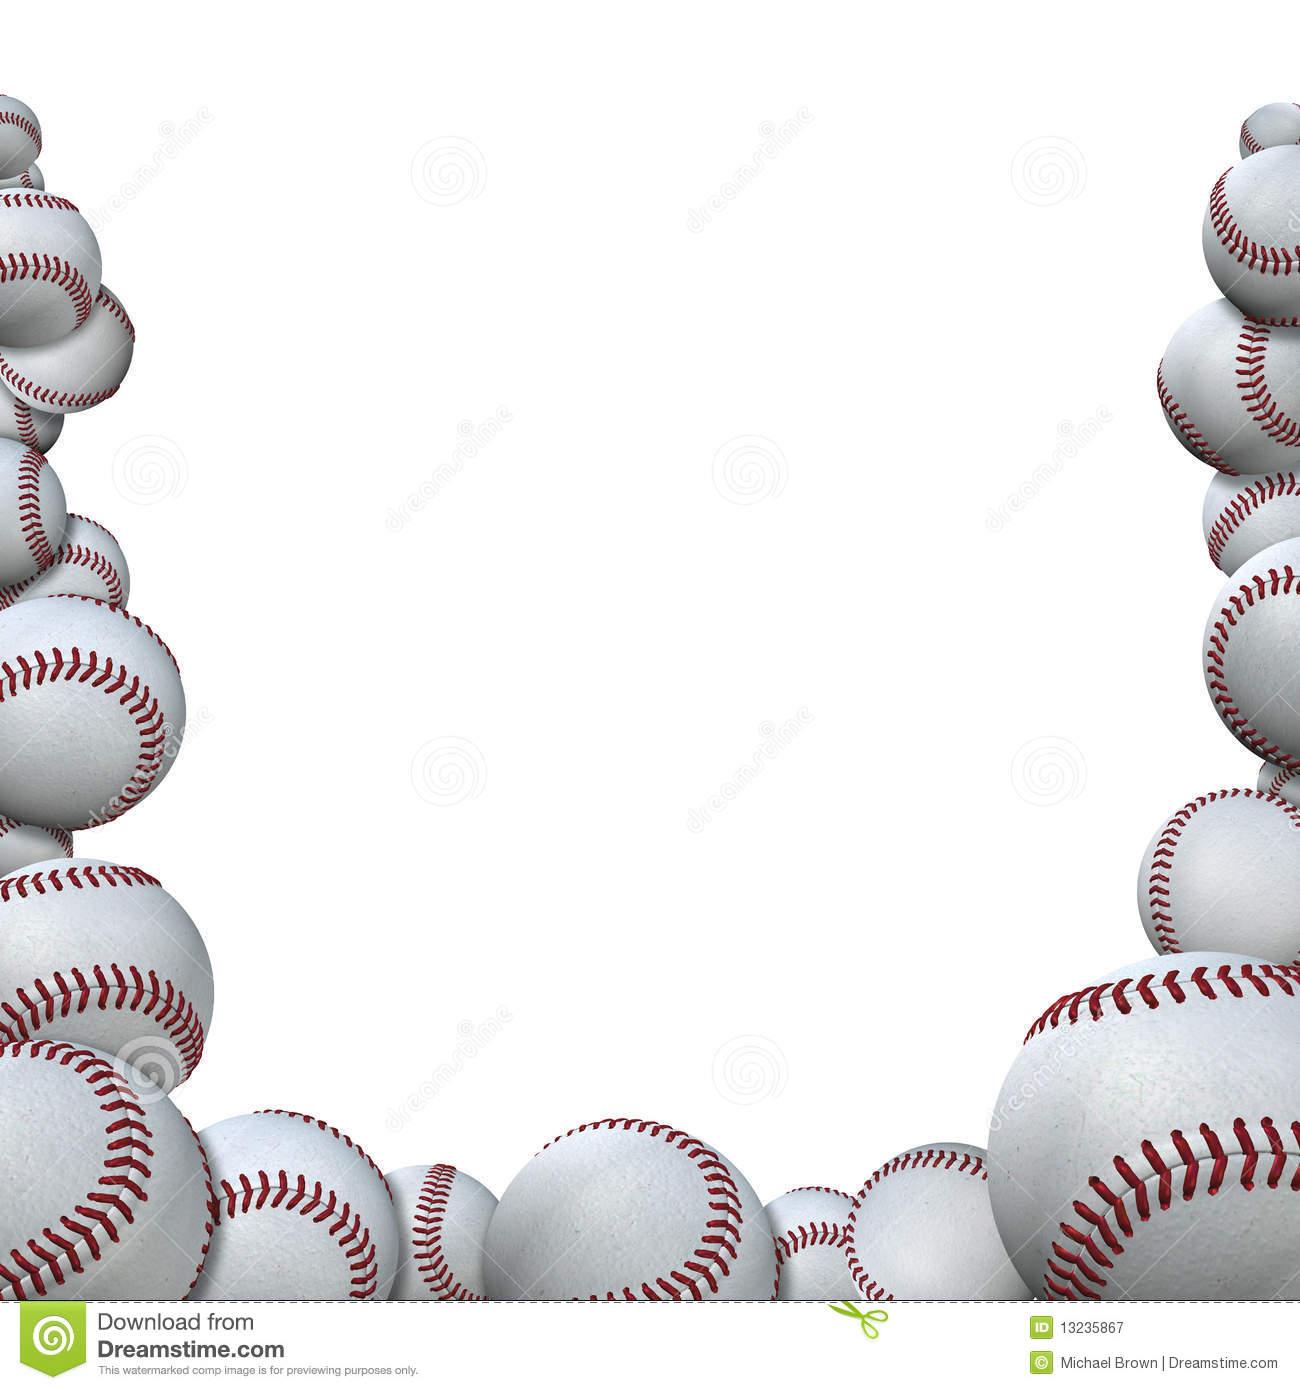 Baseball clipart border, Baseball border Transparent FREE.